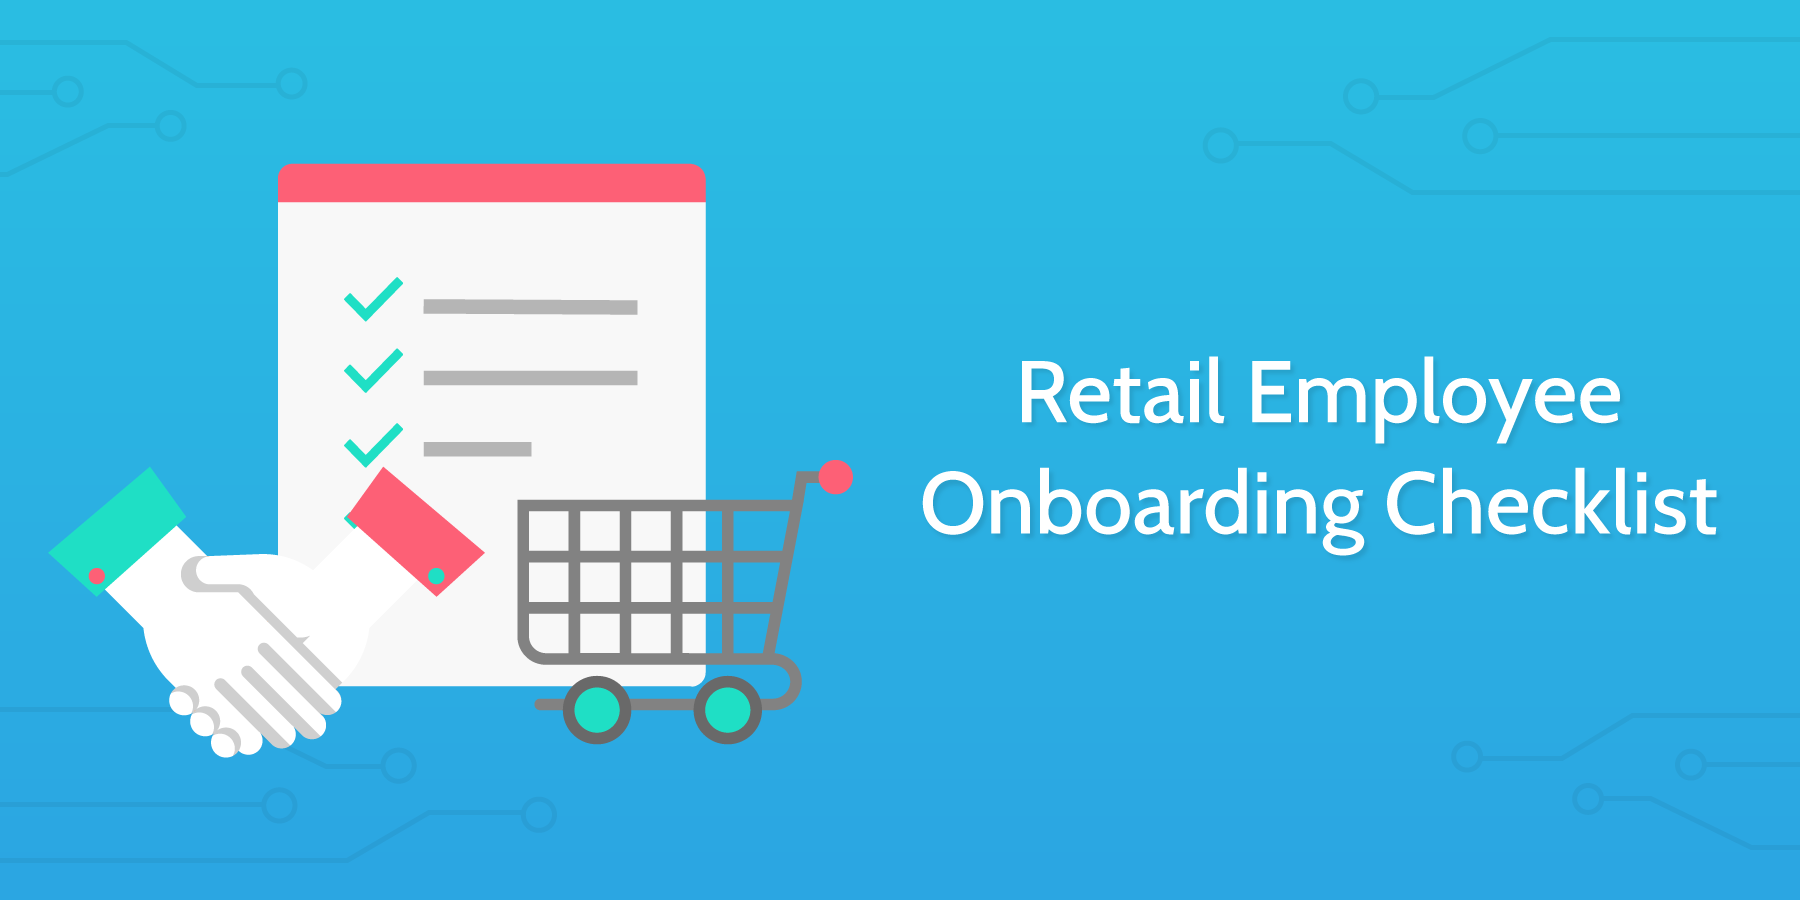 retail employee onboarding checklist